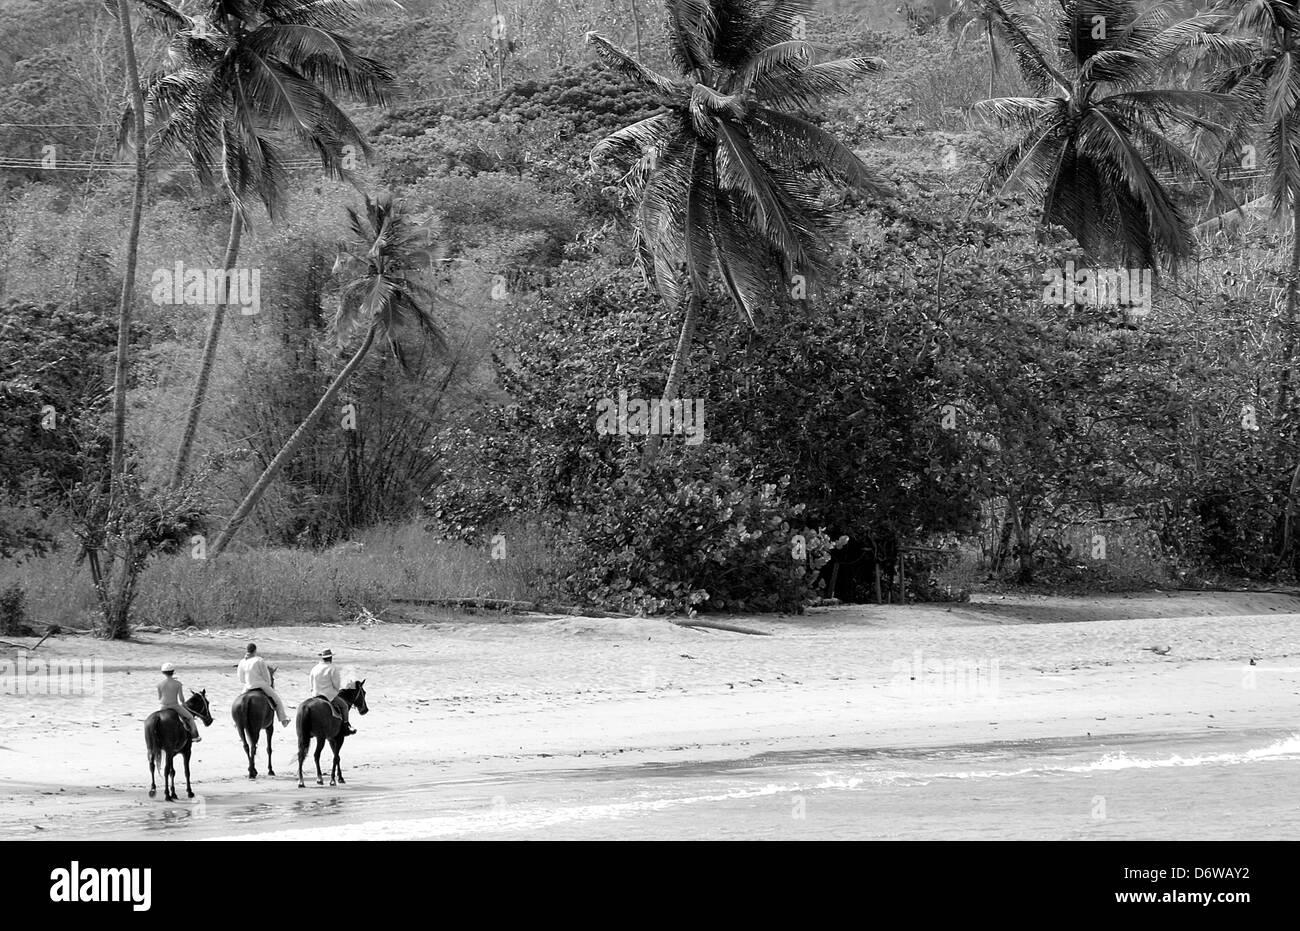 Trinidad and Tobago, Tobago, Courland Bay Horse Riding - Stock Image